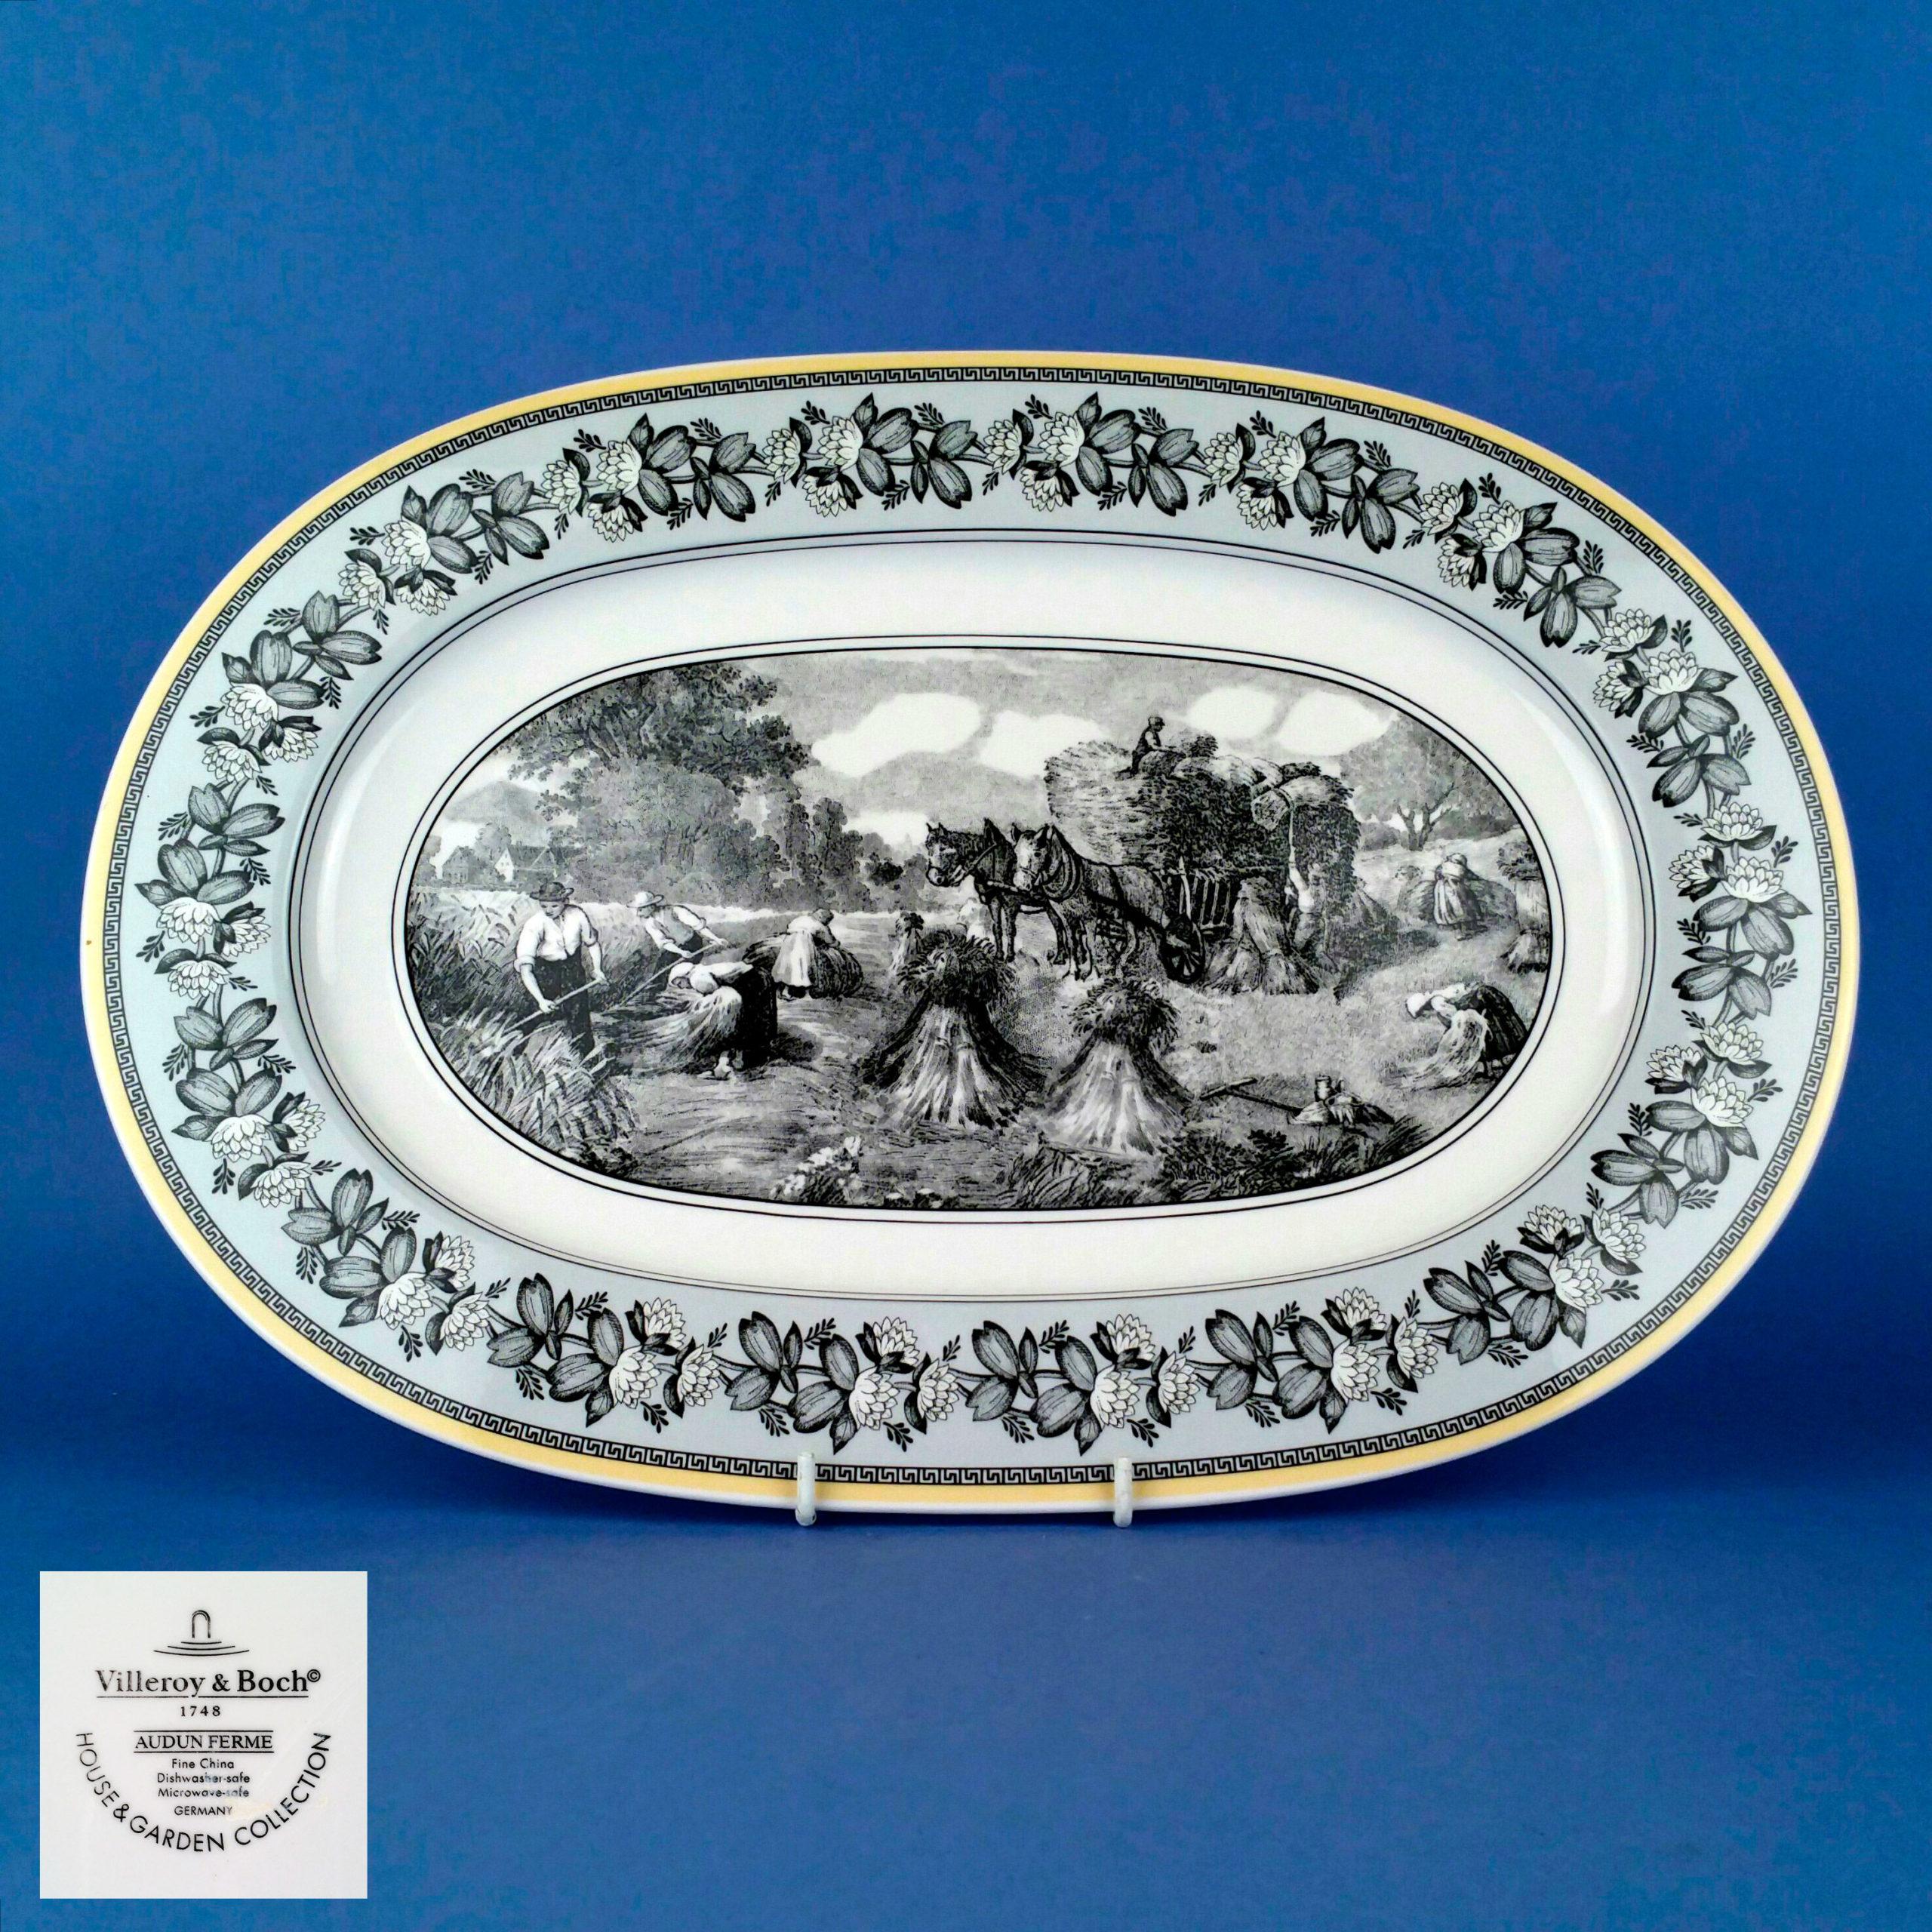 Villeroy Boch Audun Ferme 41cm Oval Platter 10 1067 2960 Designerxs